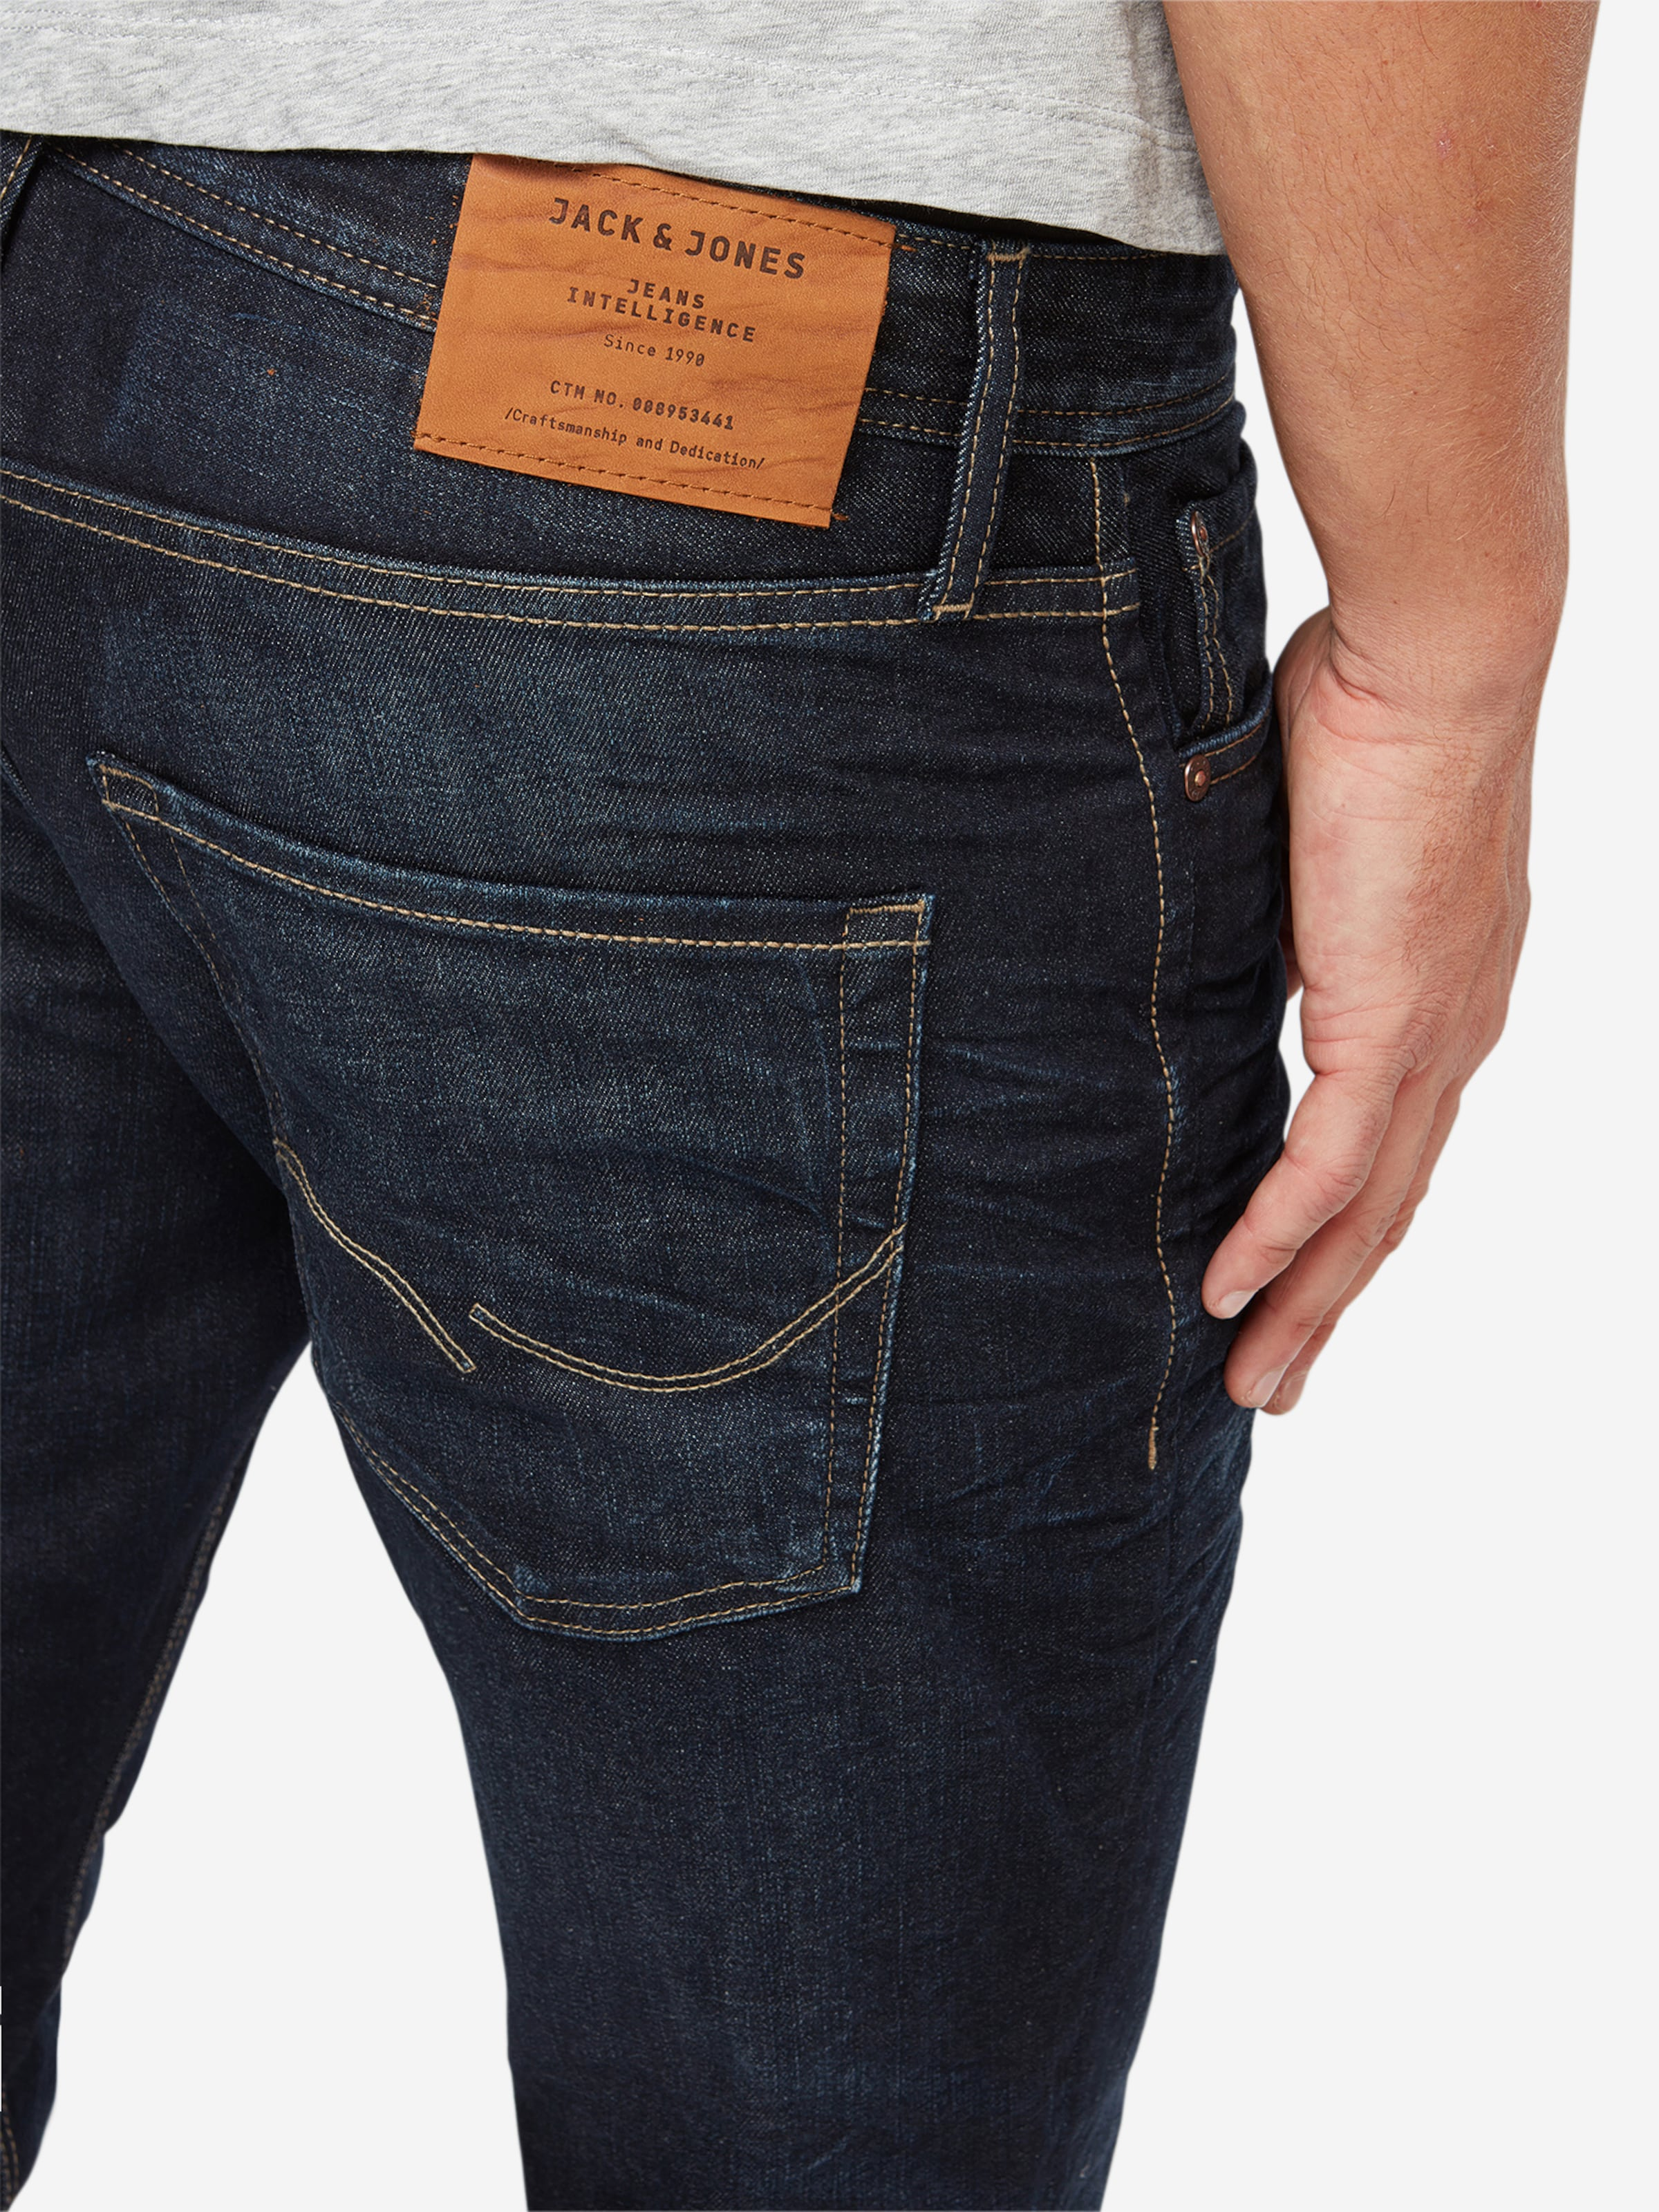 JACK & JONES Regular fit Jeans Clark Original JOS 318 Günstigster Preis RJ6Nq2x6